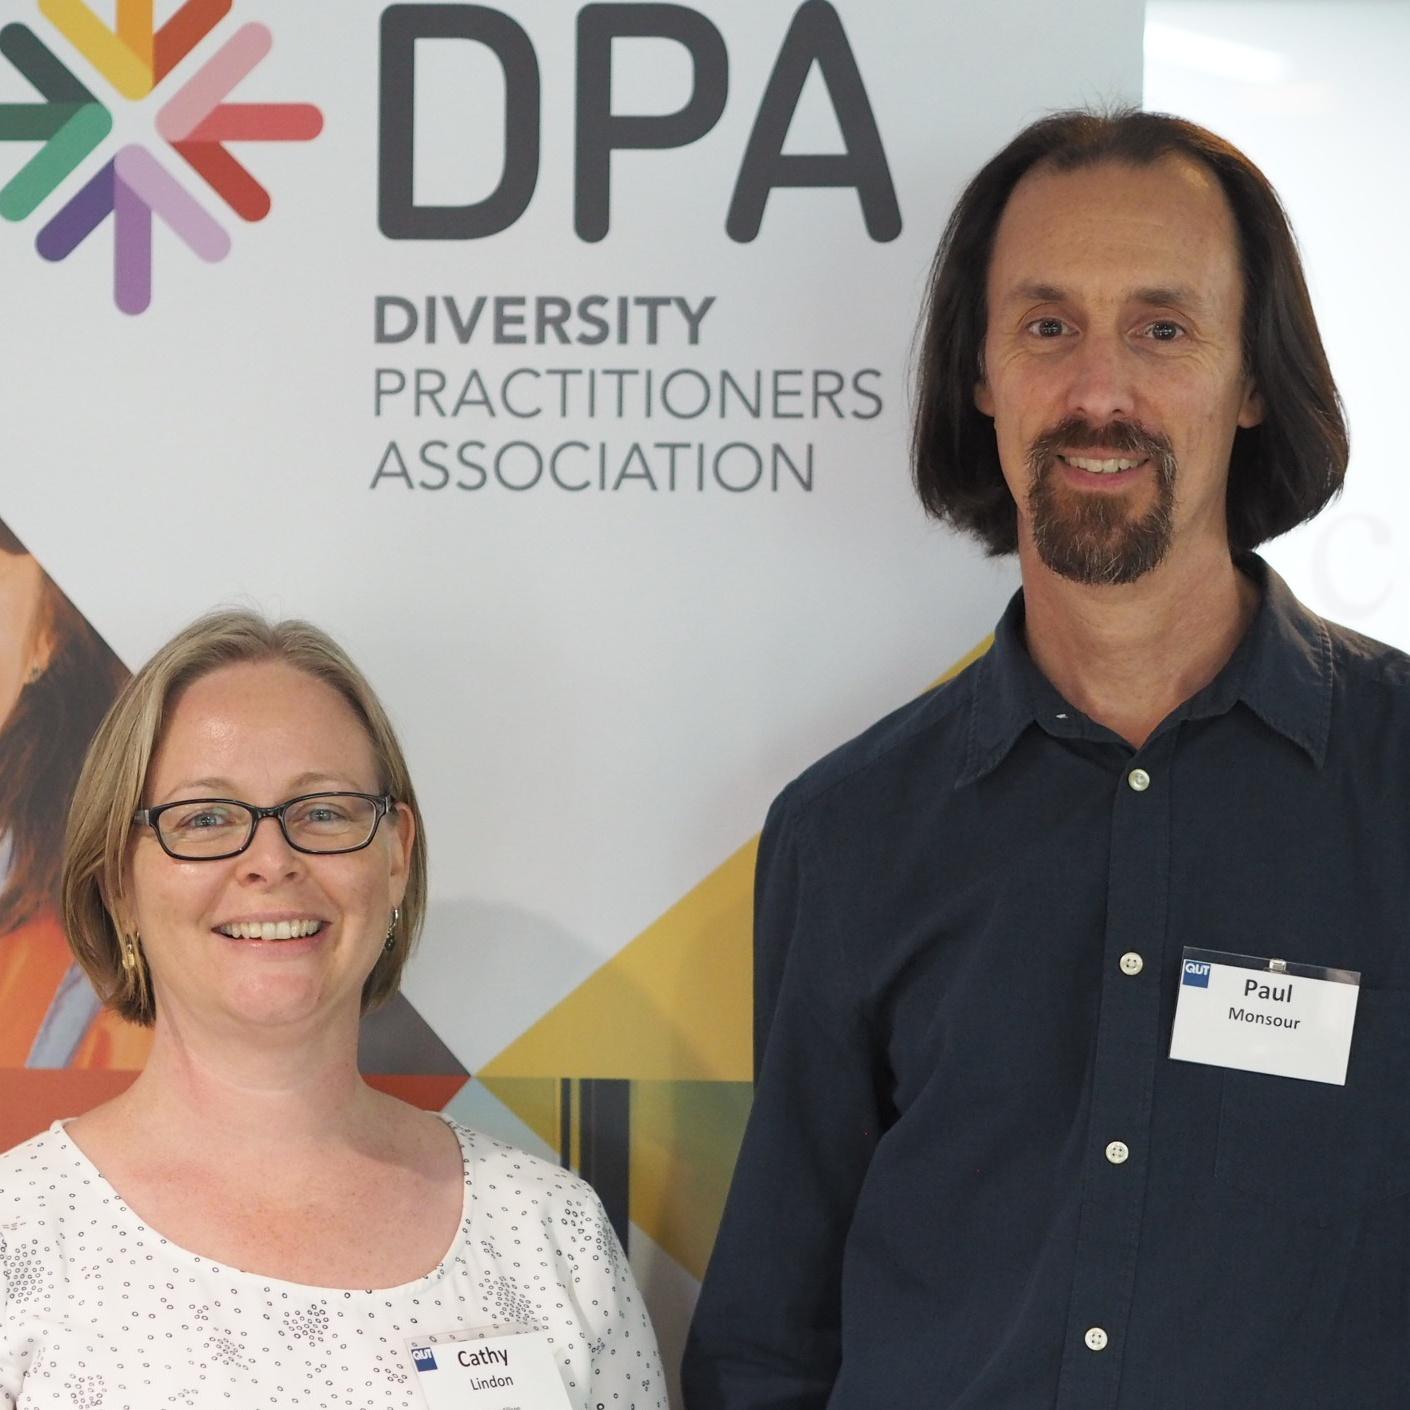 Paul and Kathy_DPA DFV Symposium.jpg